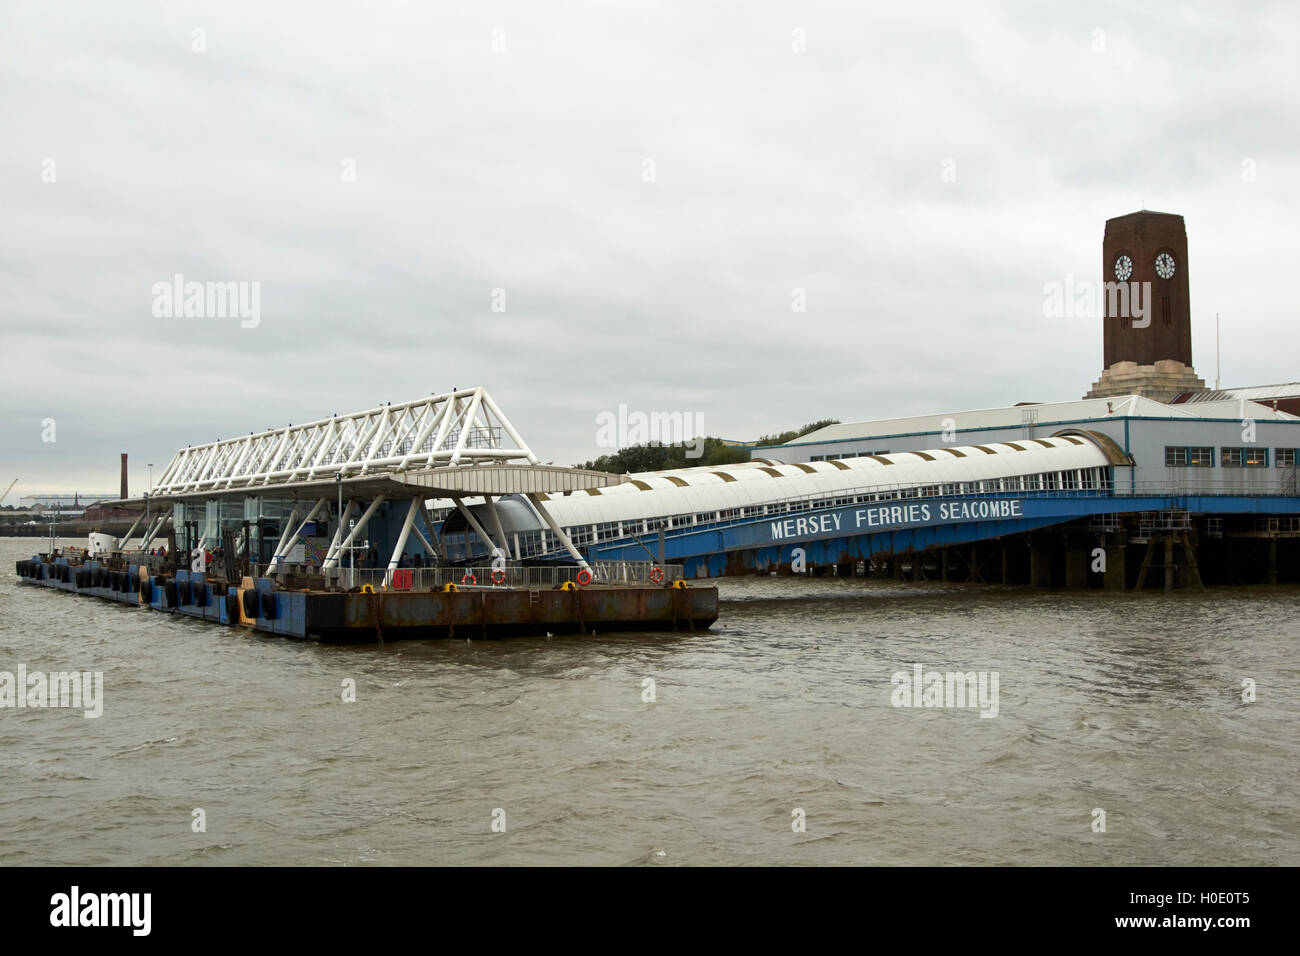 seacombe mersey ferries ferry terminal Liverpool Merseyside UK - Stock Image